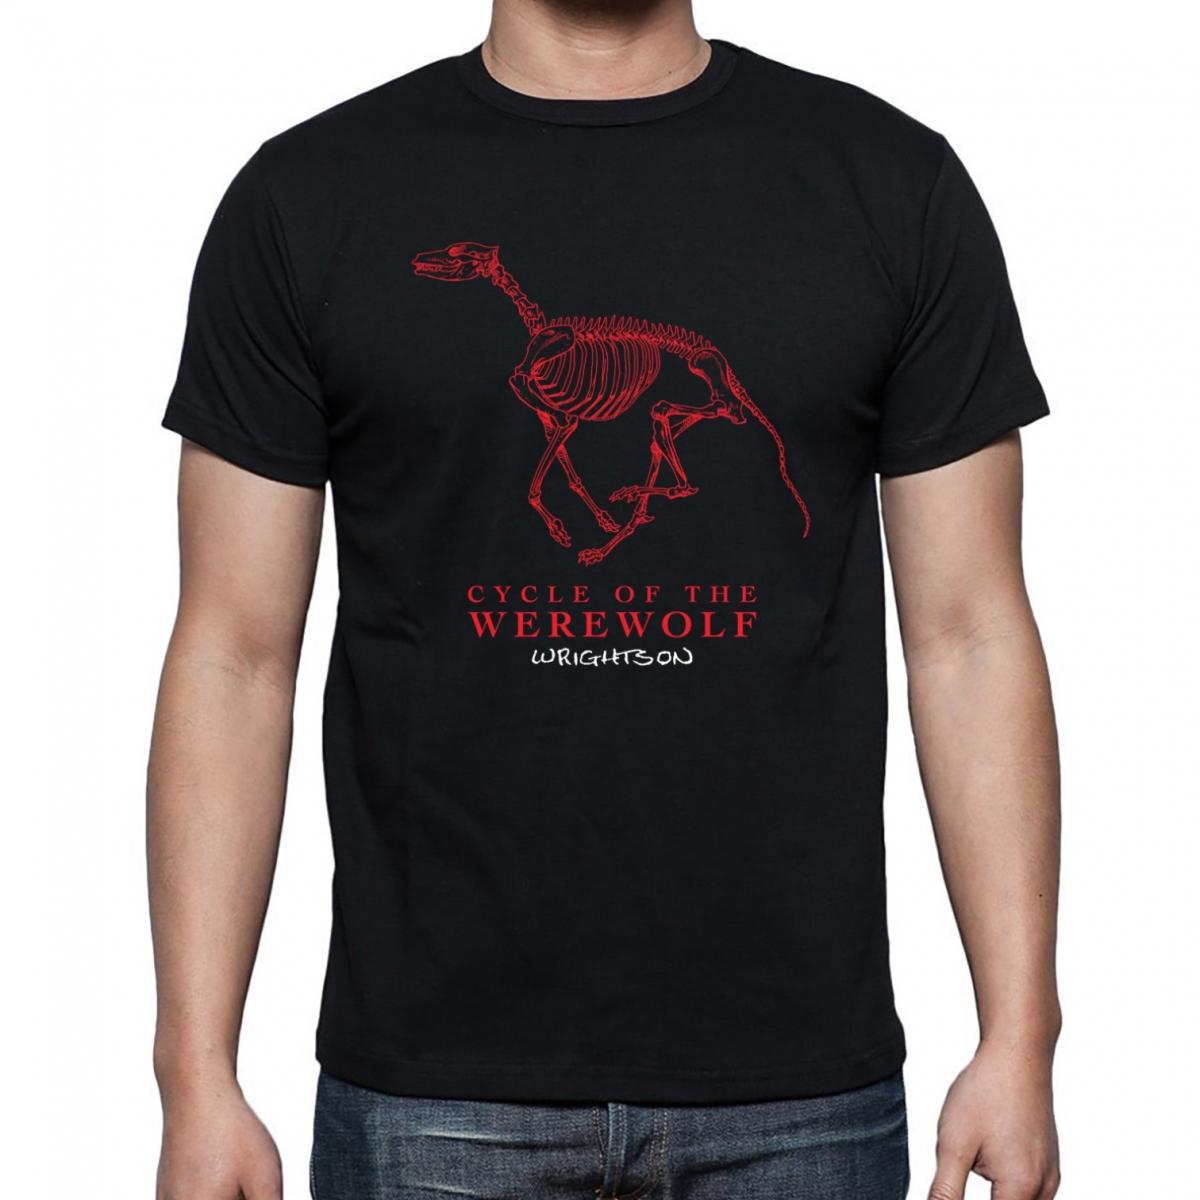 Cycle of Werewolf - koszulka - obrazek